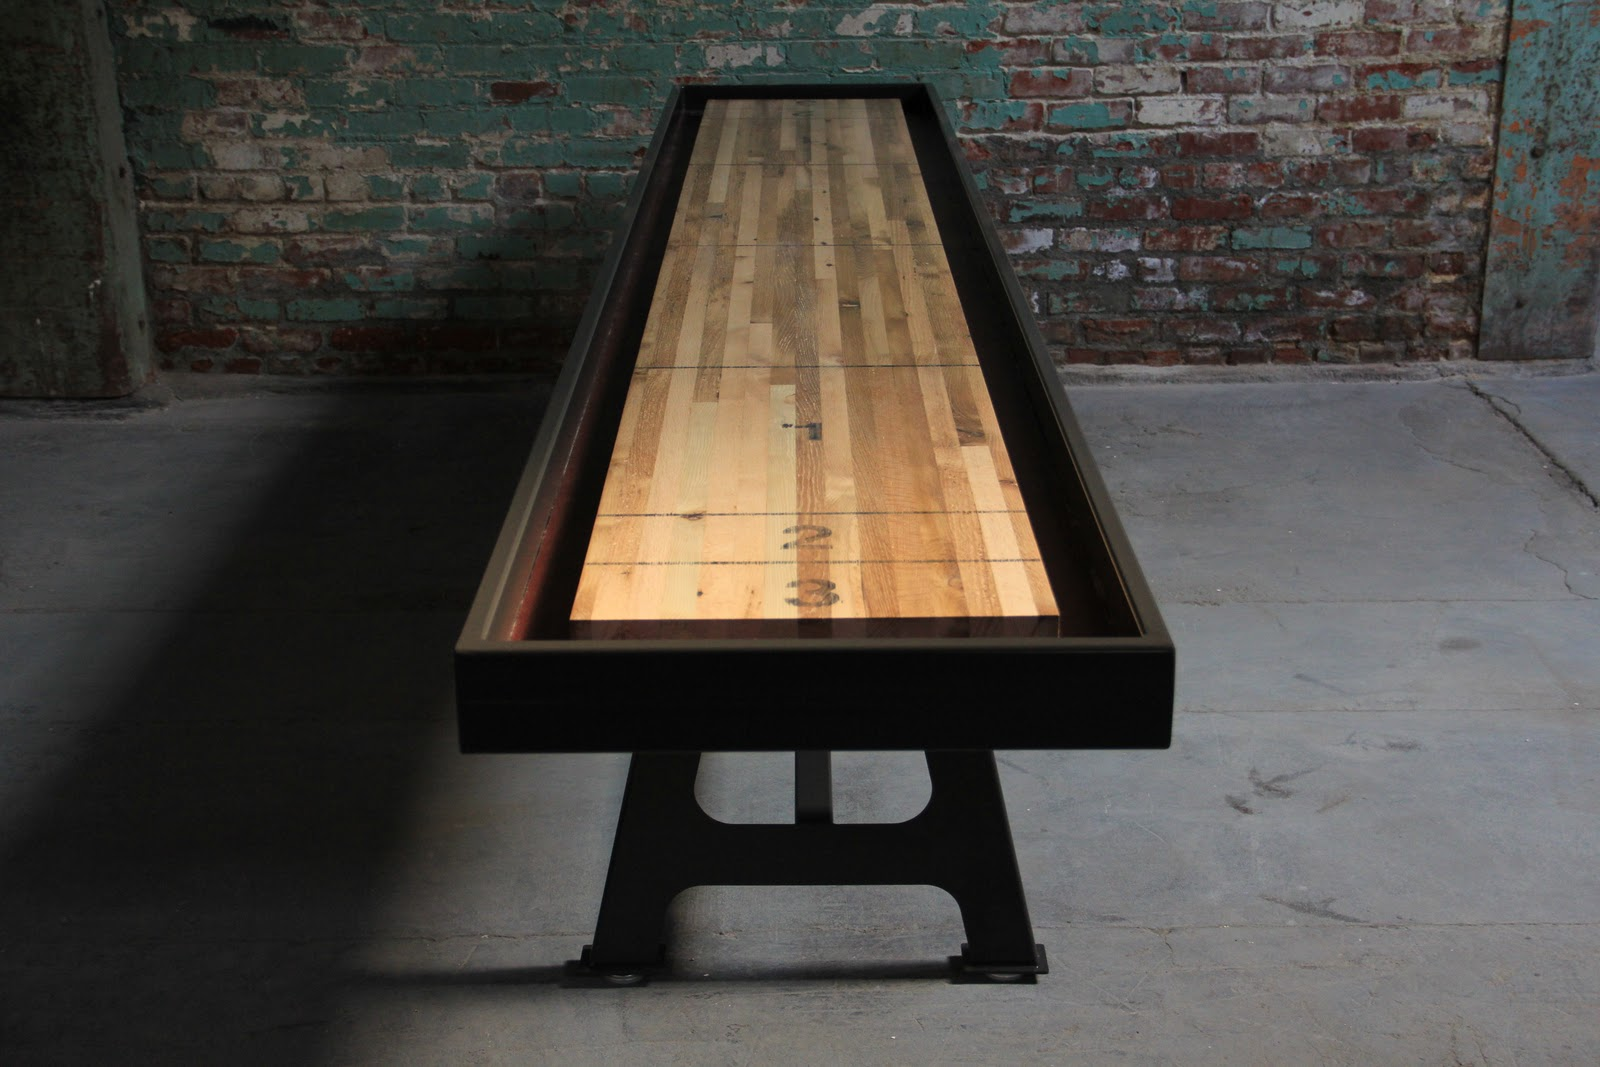 Jocundist Shuffleboard Table Made With Reclaimed Oak On Steel